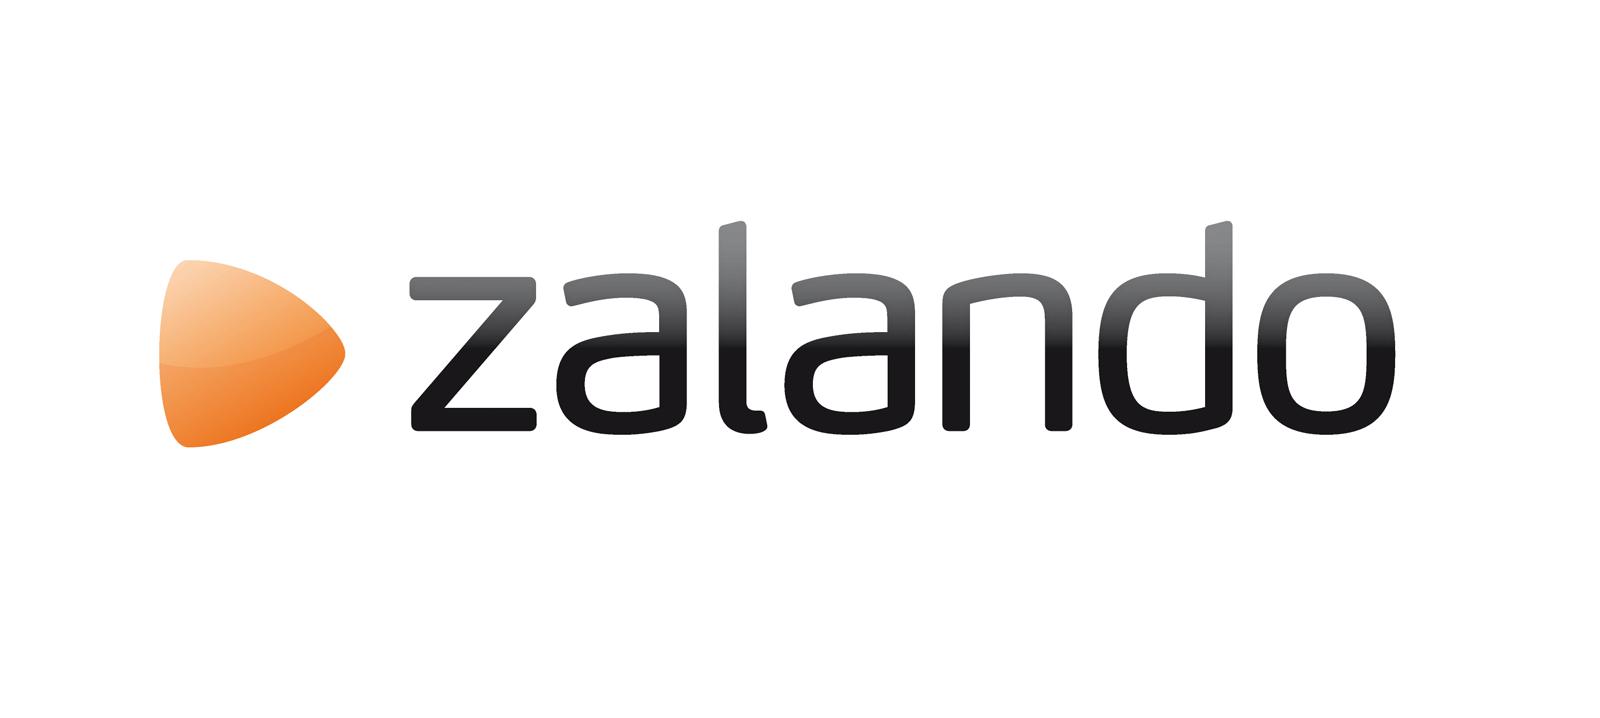 Zalando - Historia de éxito